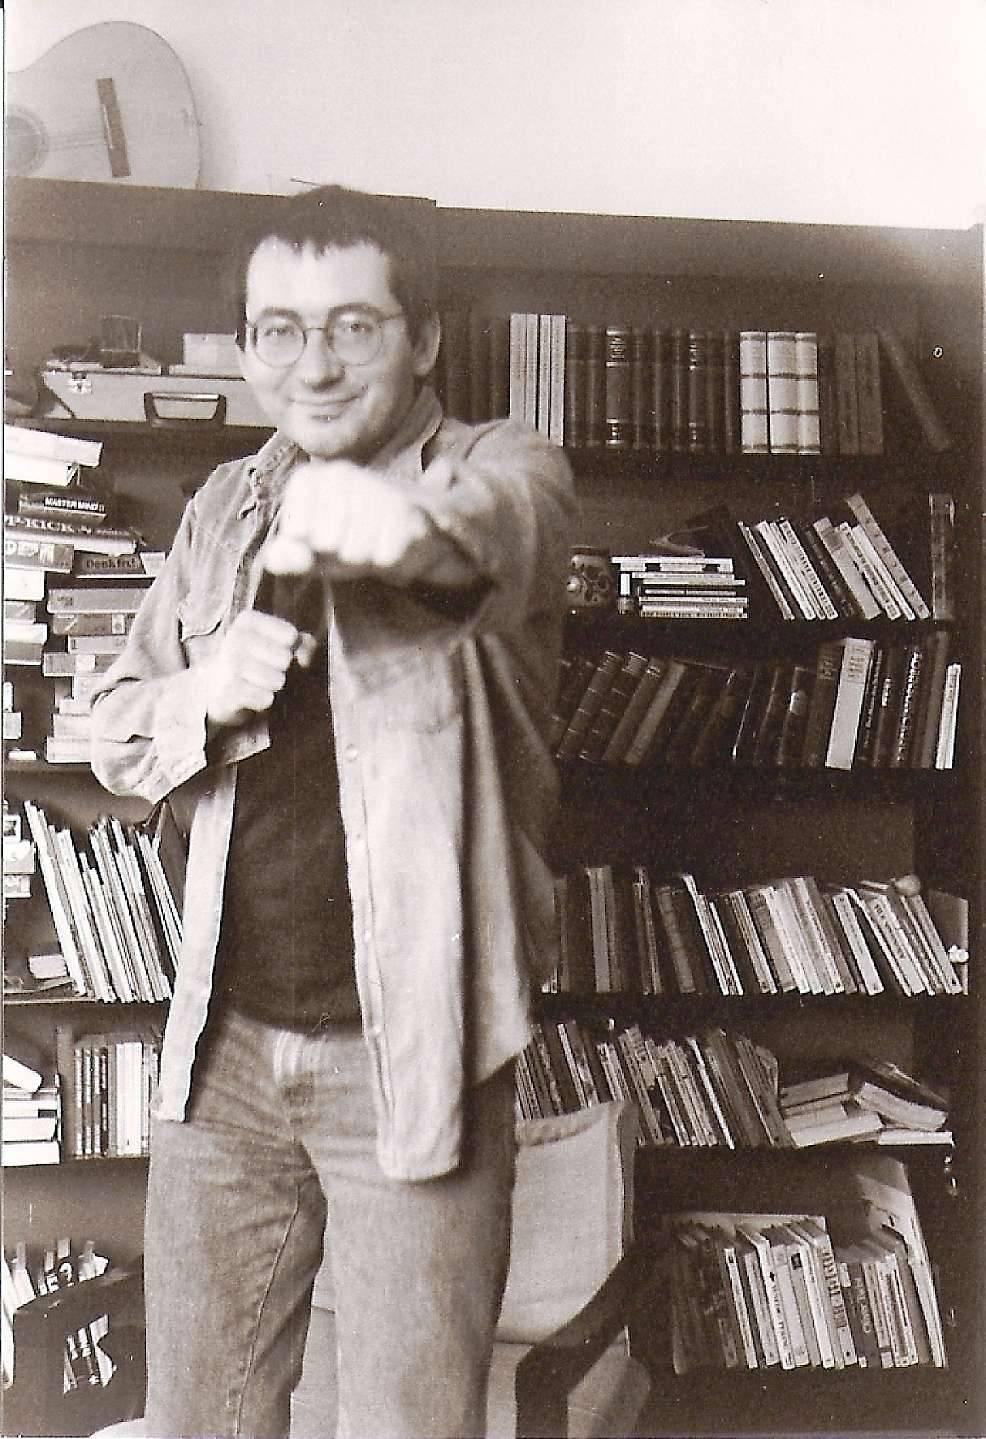 Fausers Nächte. Kampflustig. Jörg Fauser in Berlin, 1983